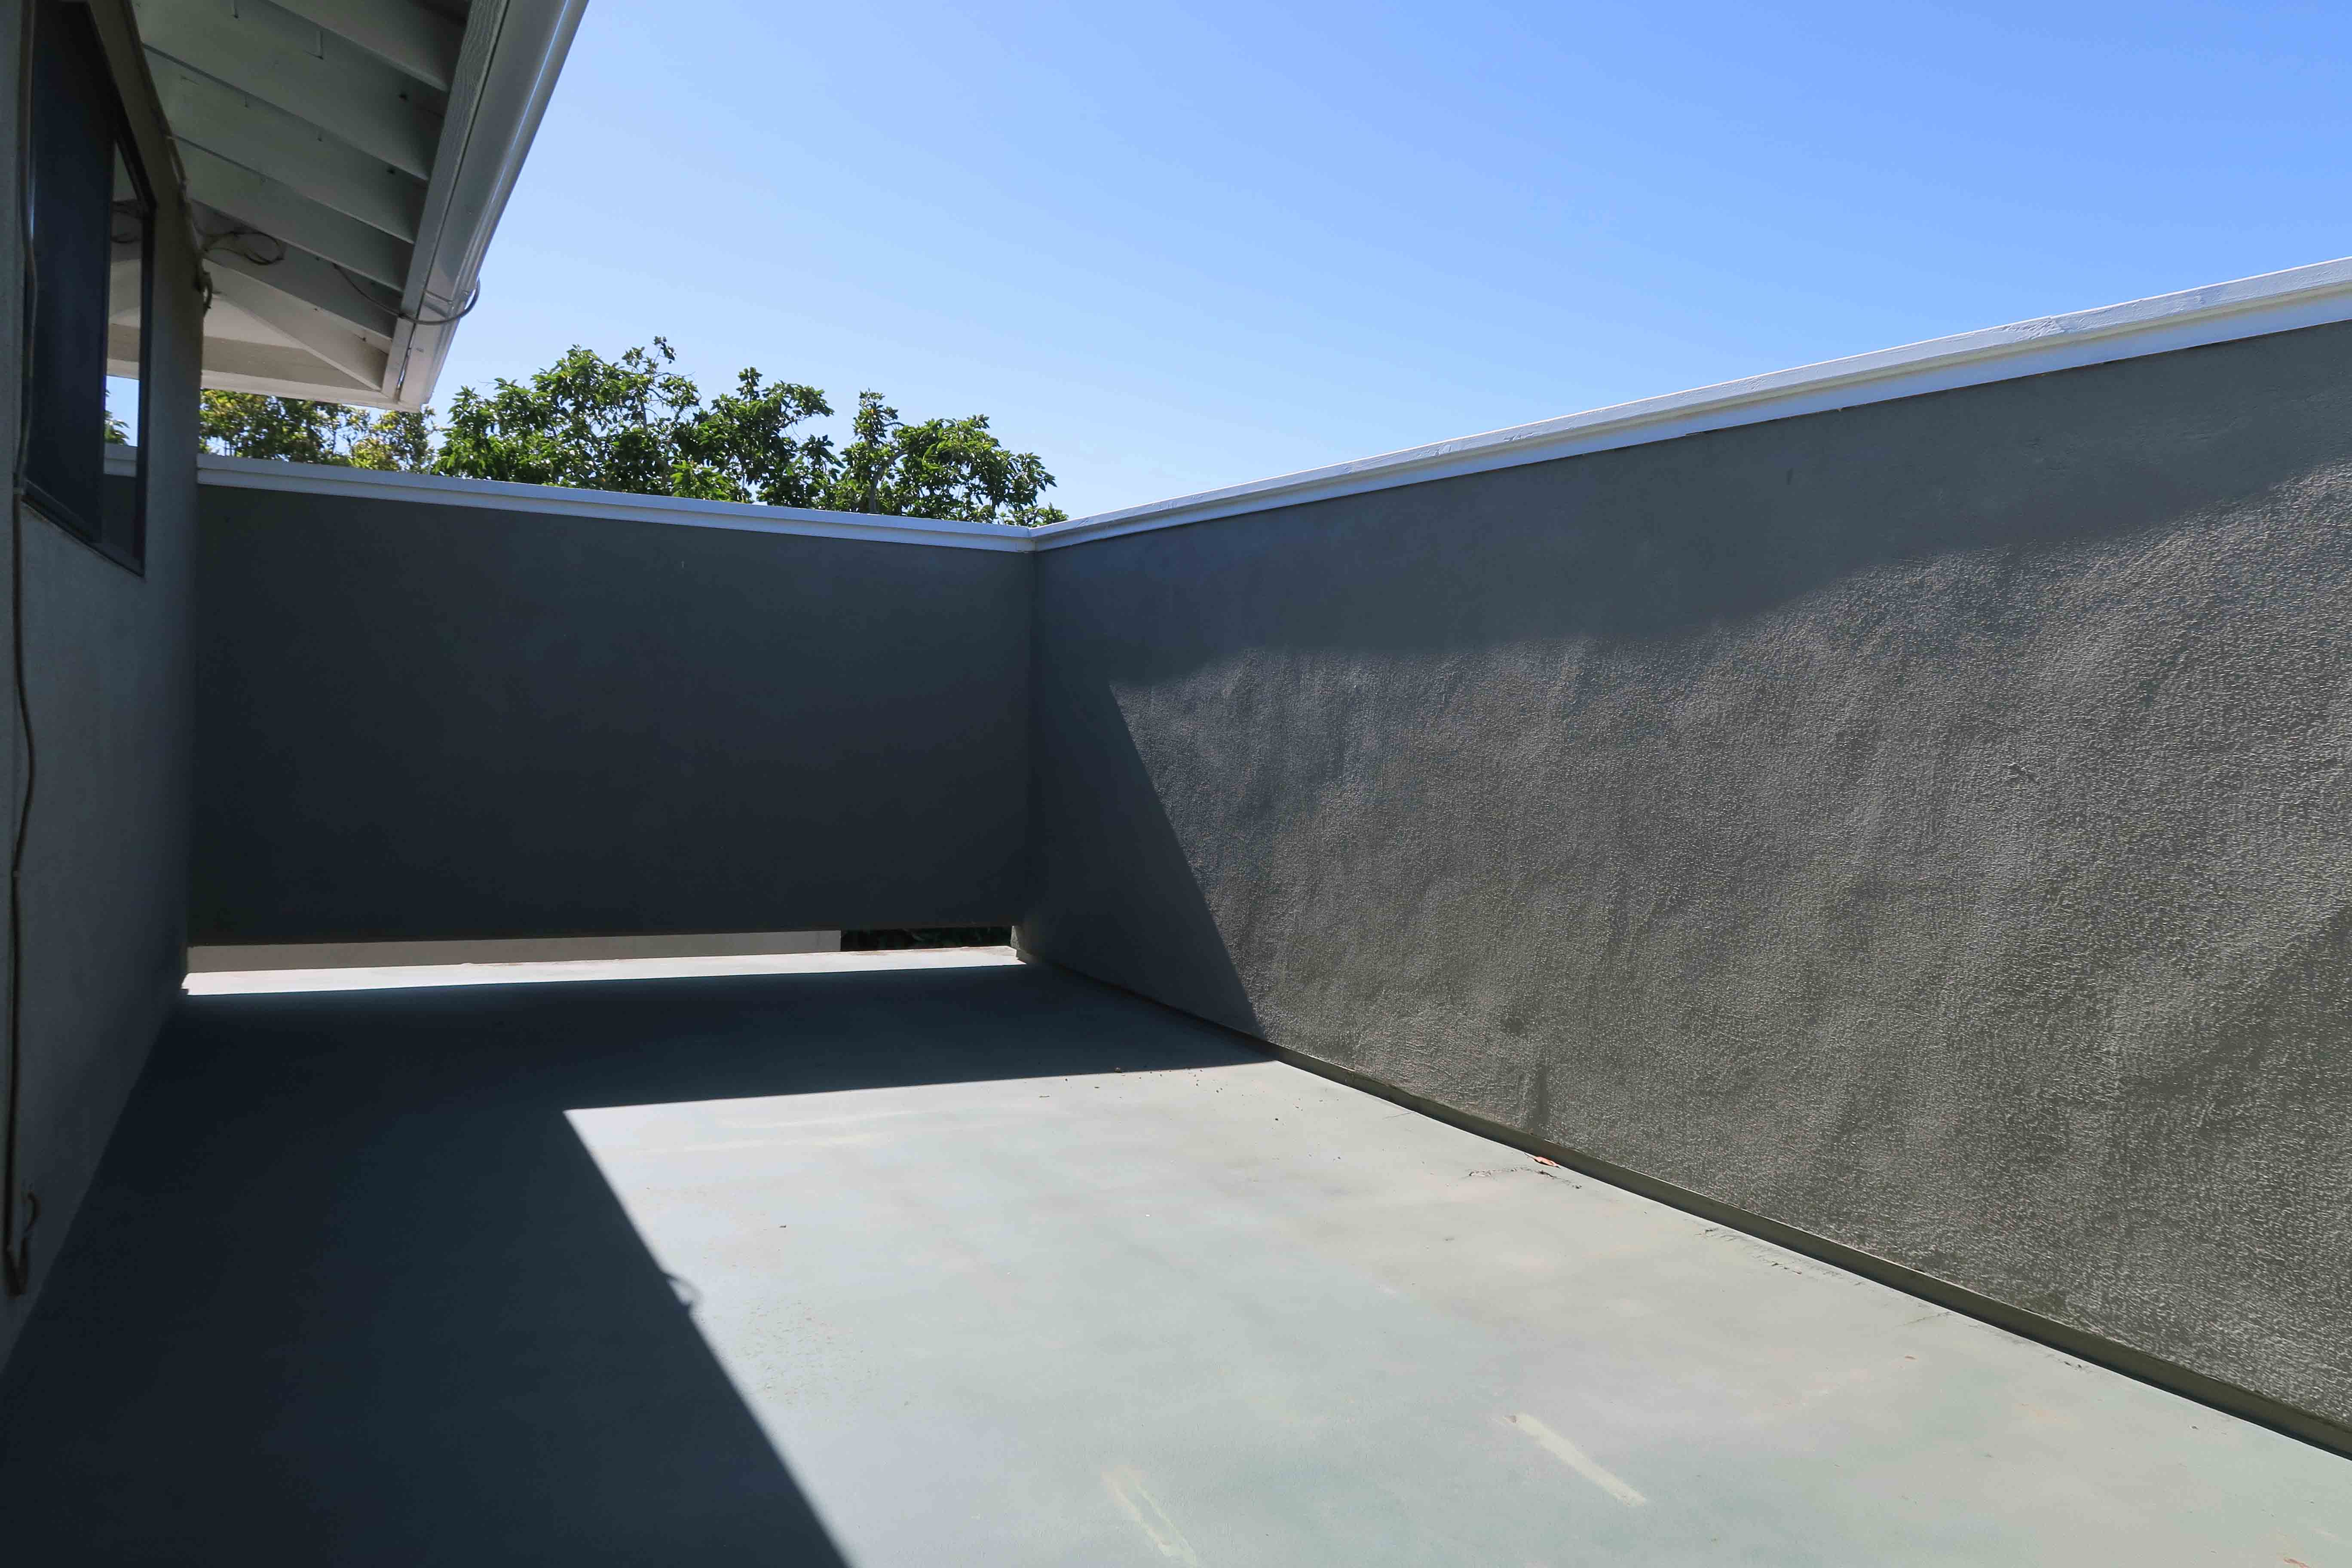 1841 Adelaide Ct, Oxnard CA 93035 Outdoor Sun Deck